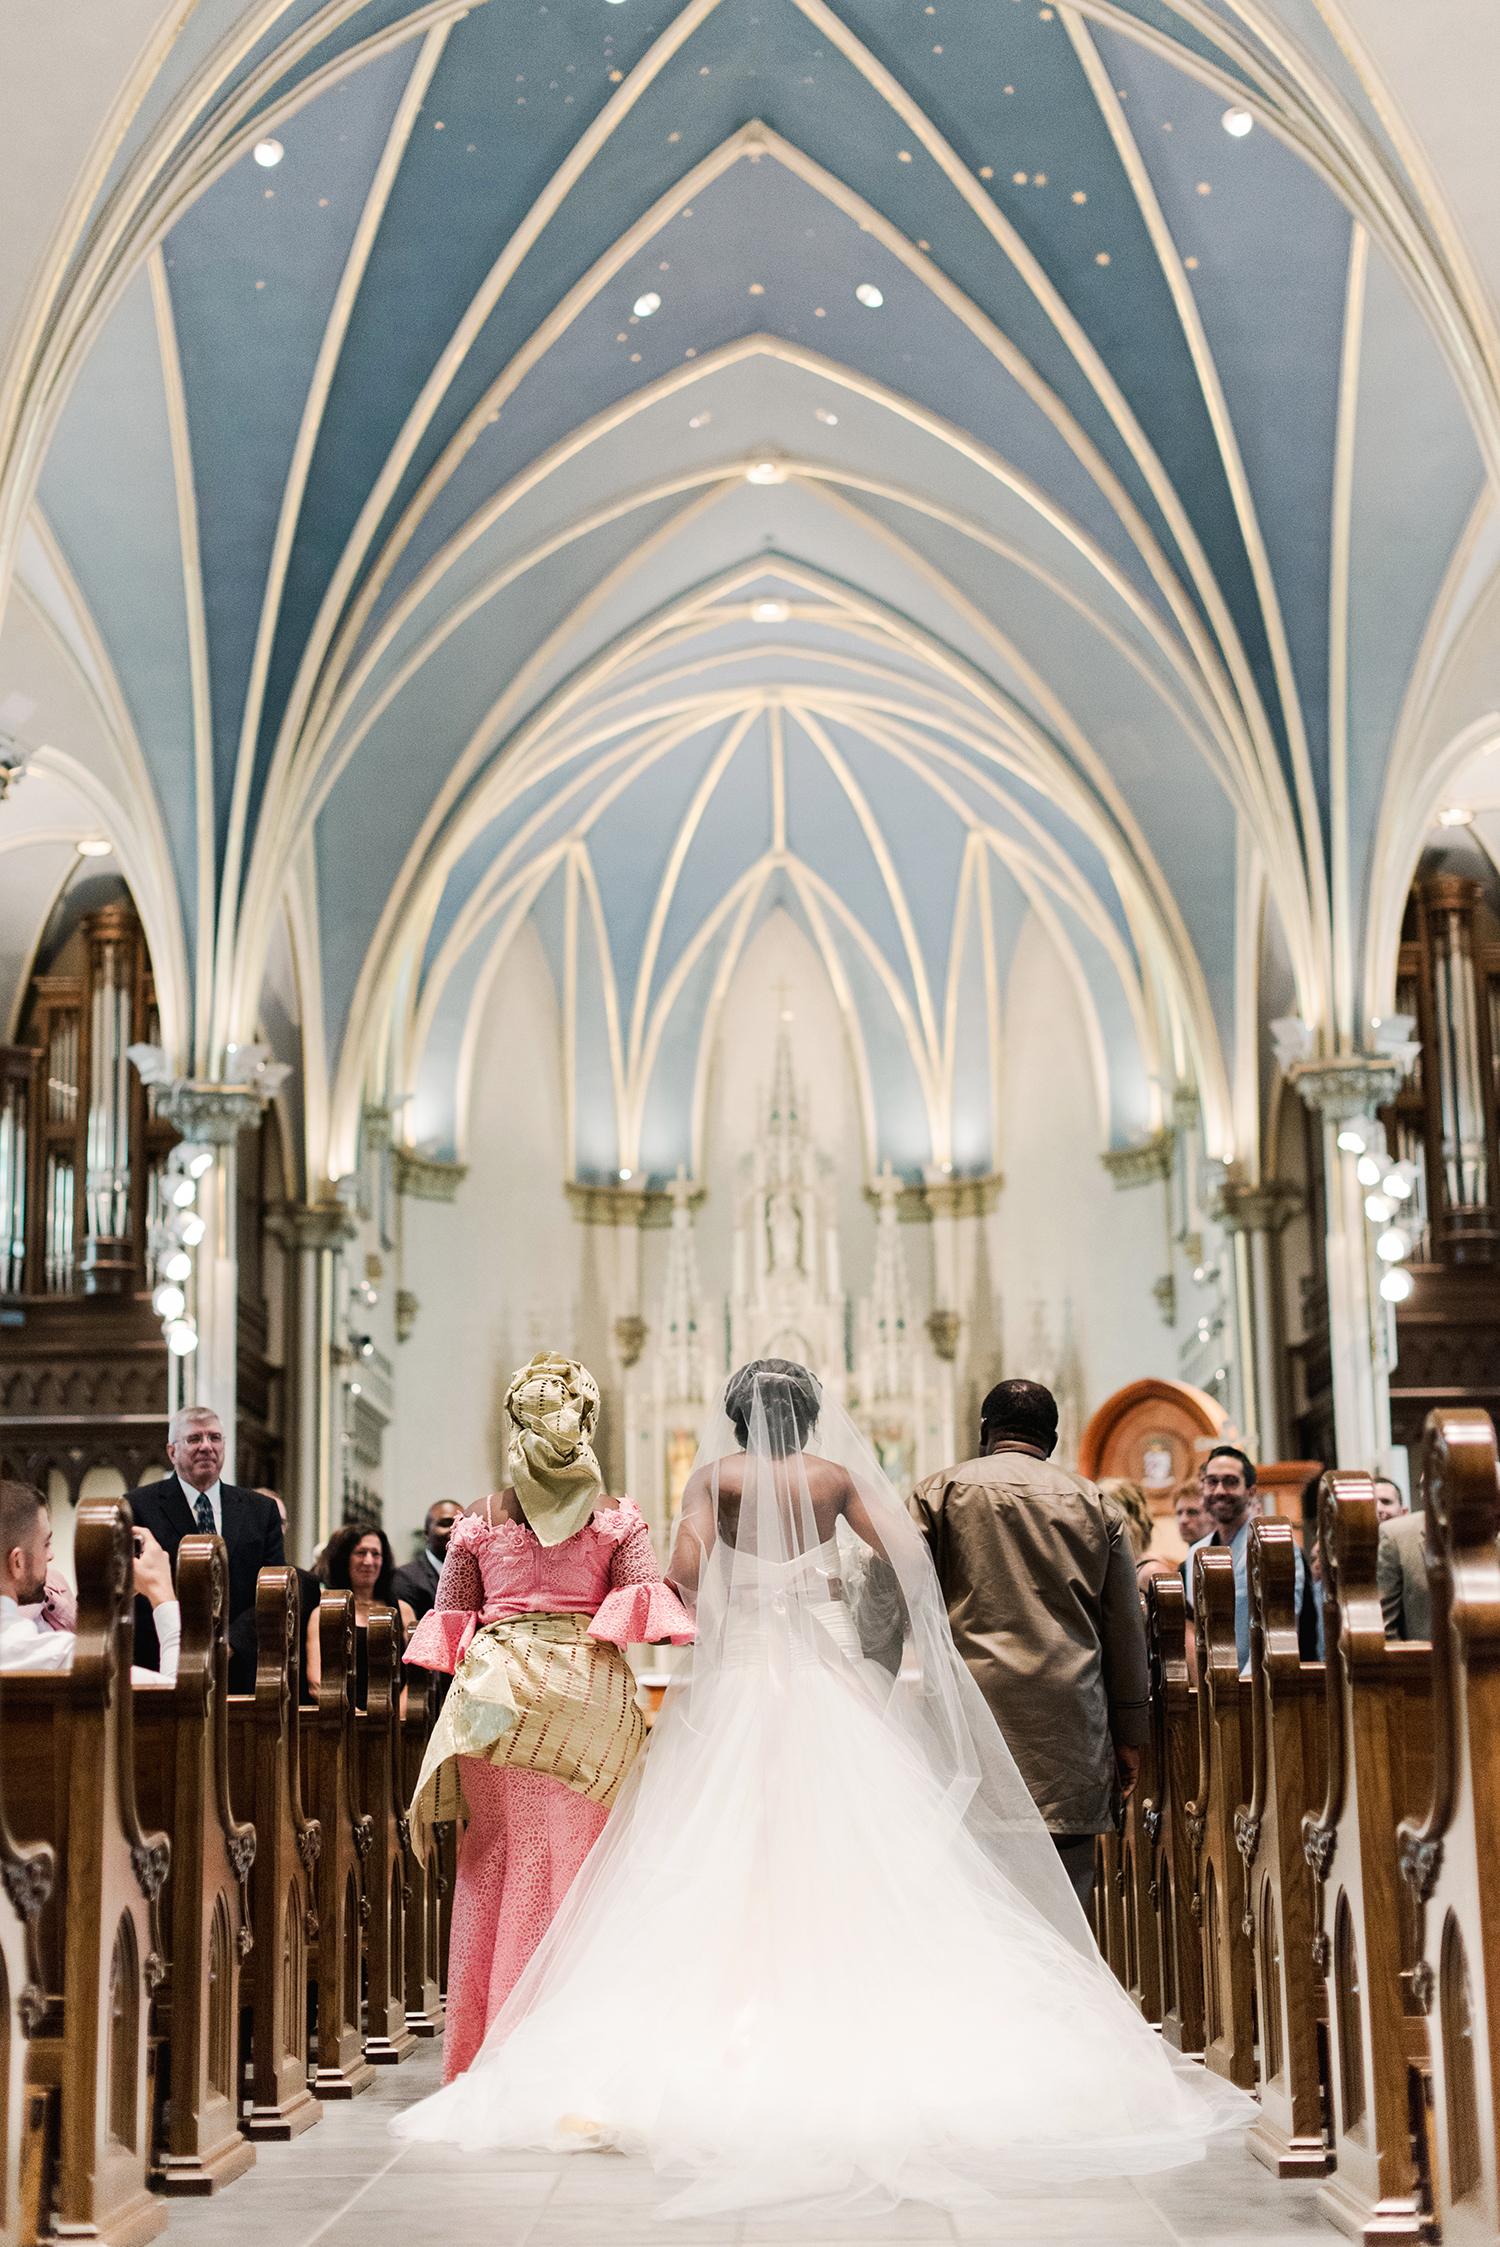 anwuli patrick wedding processional in church